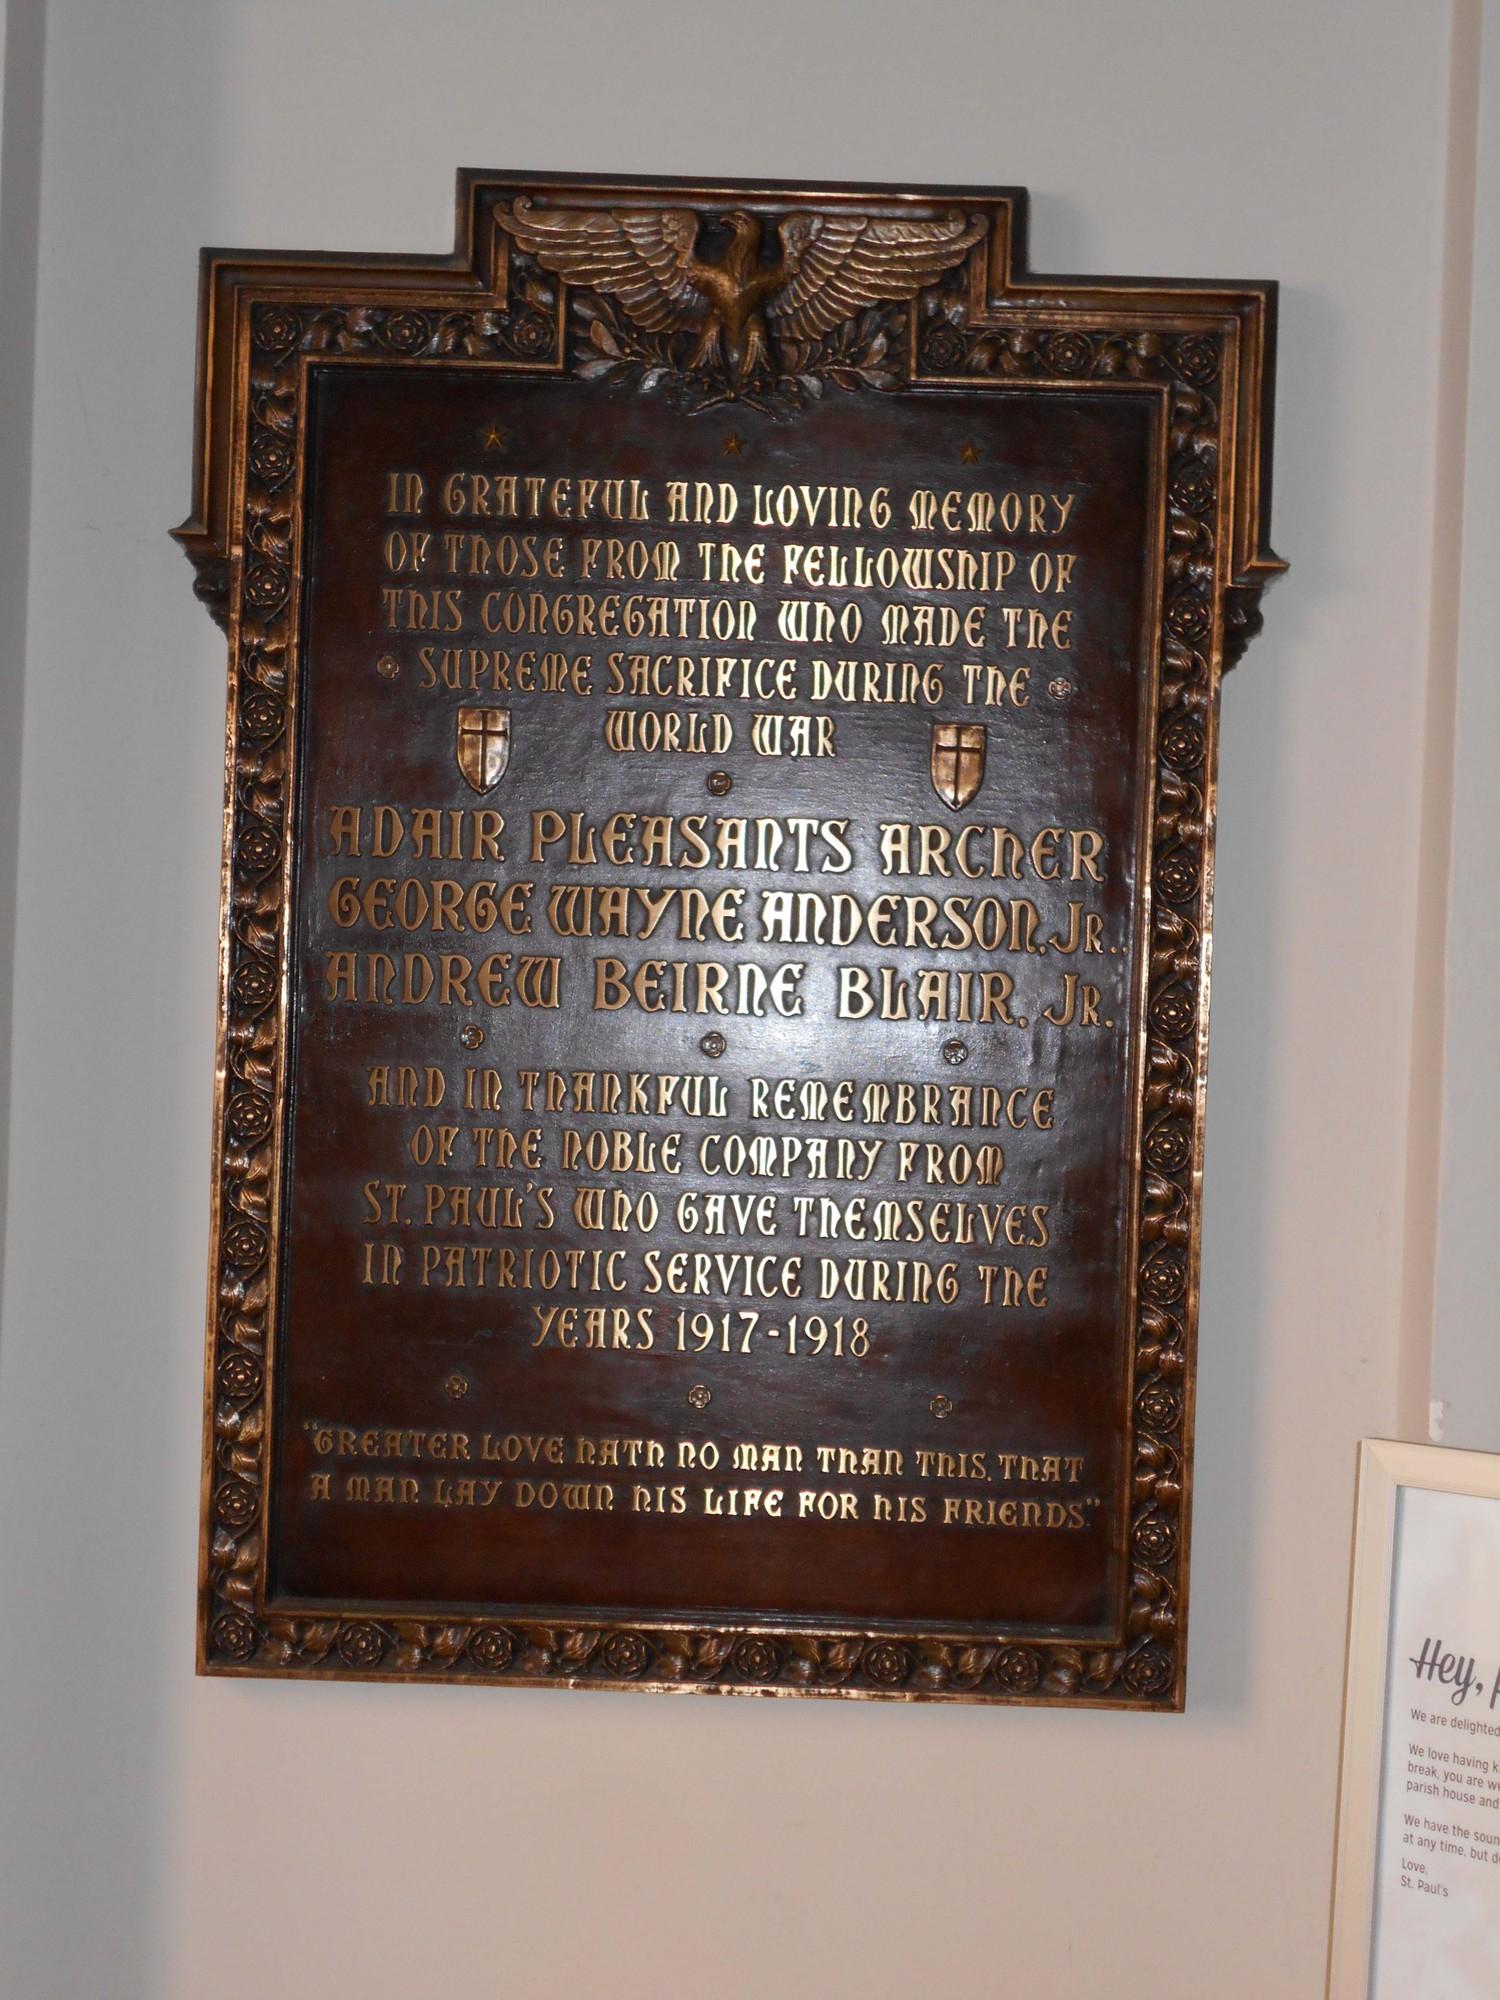 St. Paul's Episcopal Church World War I Memorial Plaque (VA)